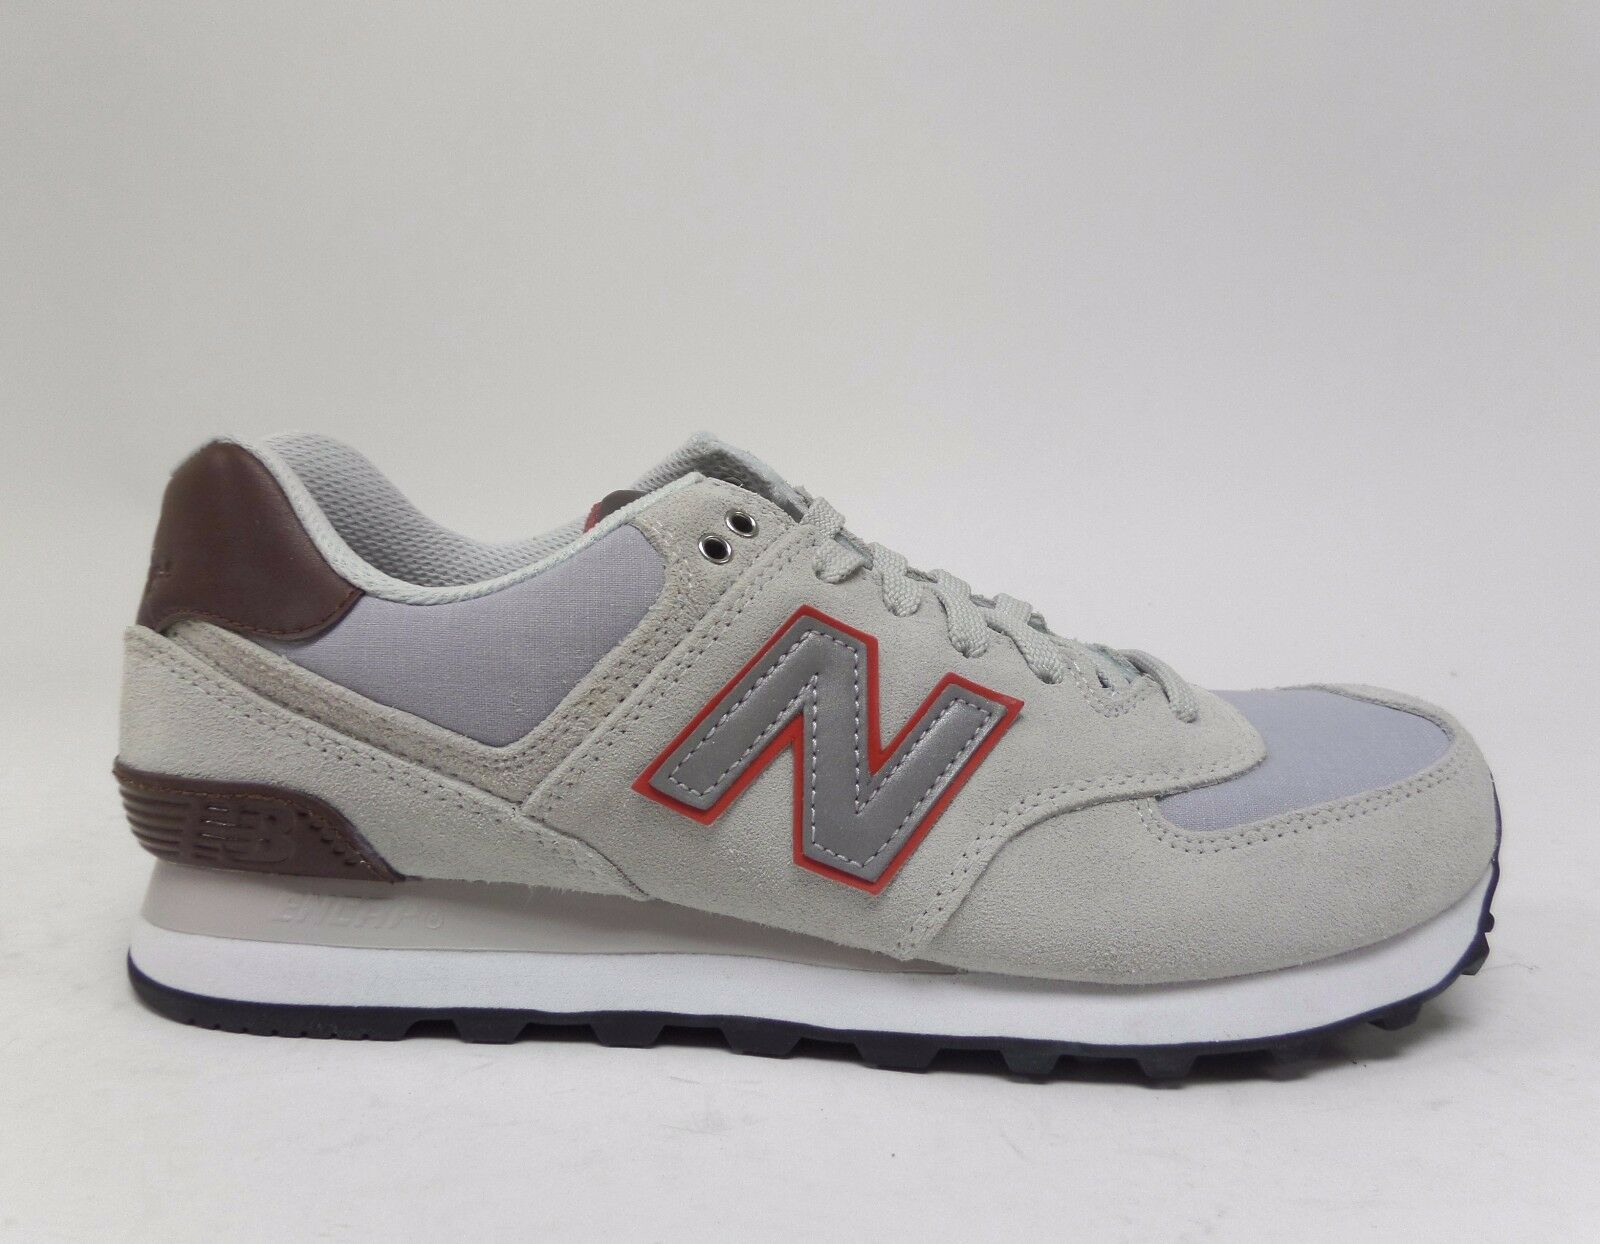 New Balance Men's CLASSIC 574 574 574 BEACH CRUISER Shoes Grey ML574BCA a 16ac95